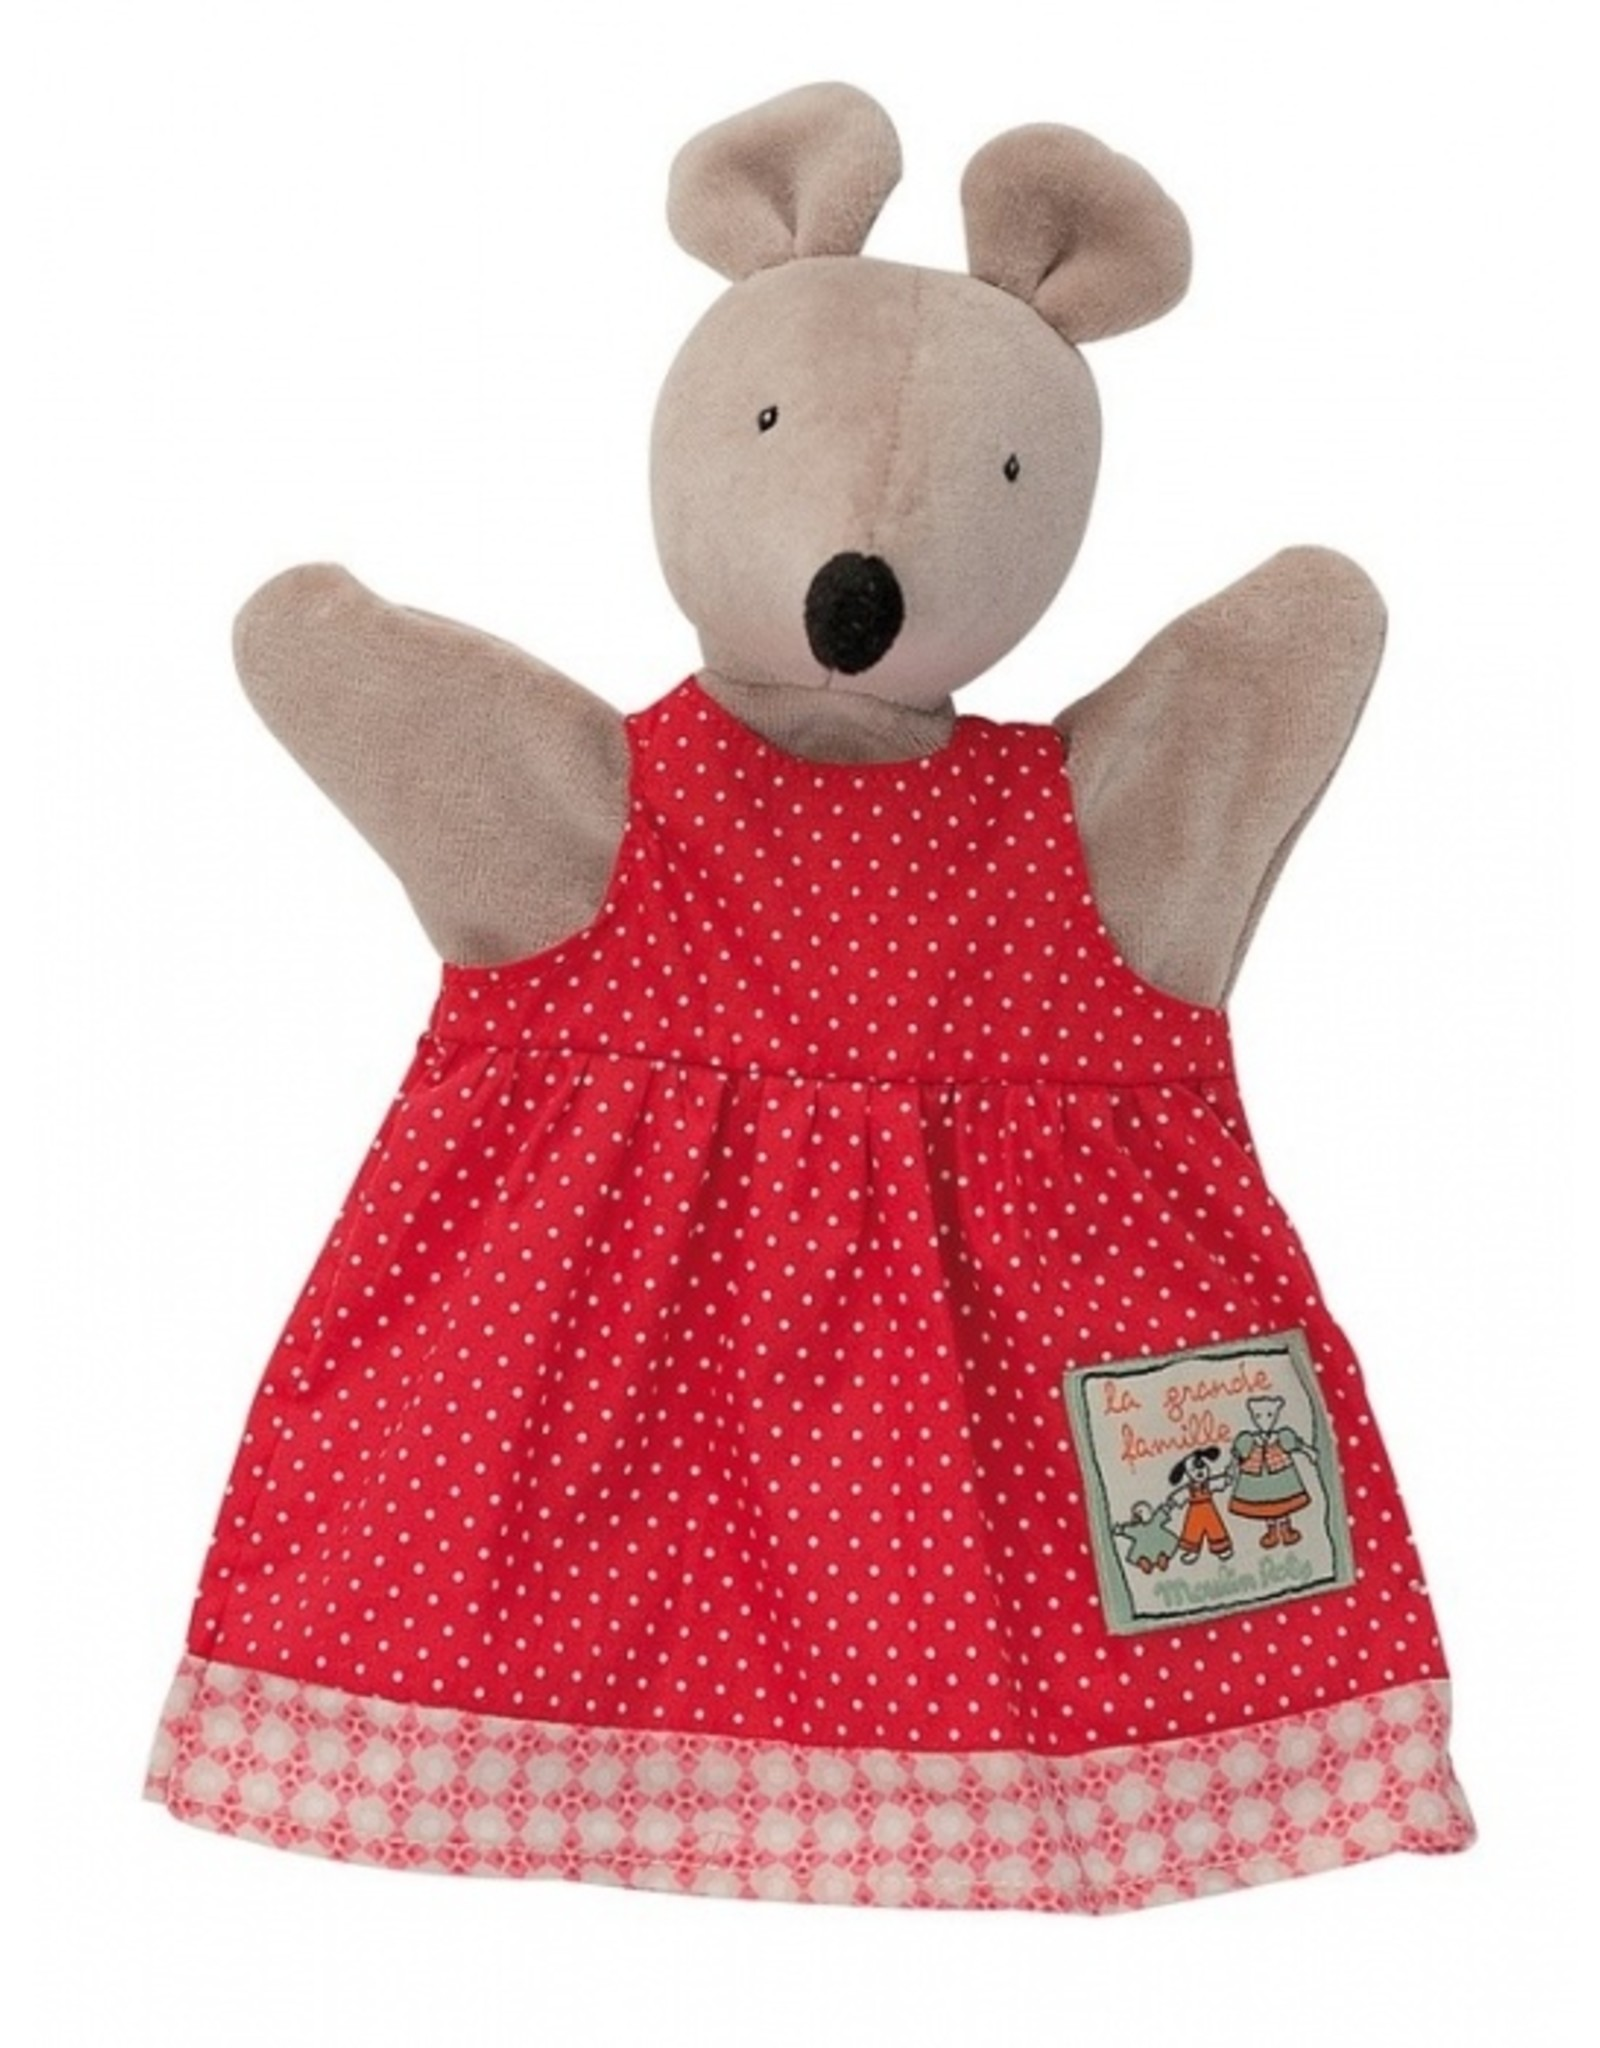 Moulin Roty Marionnette Nini, la souris